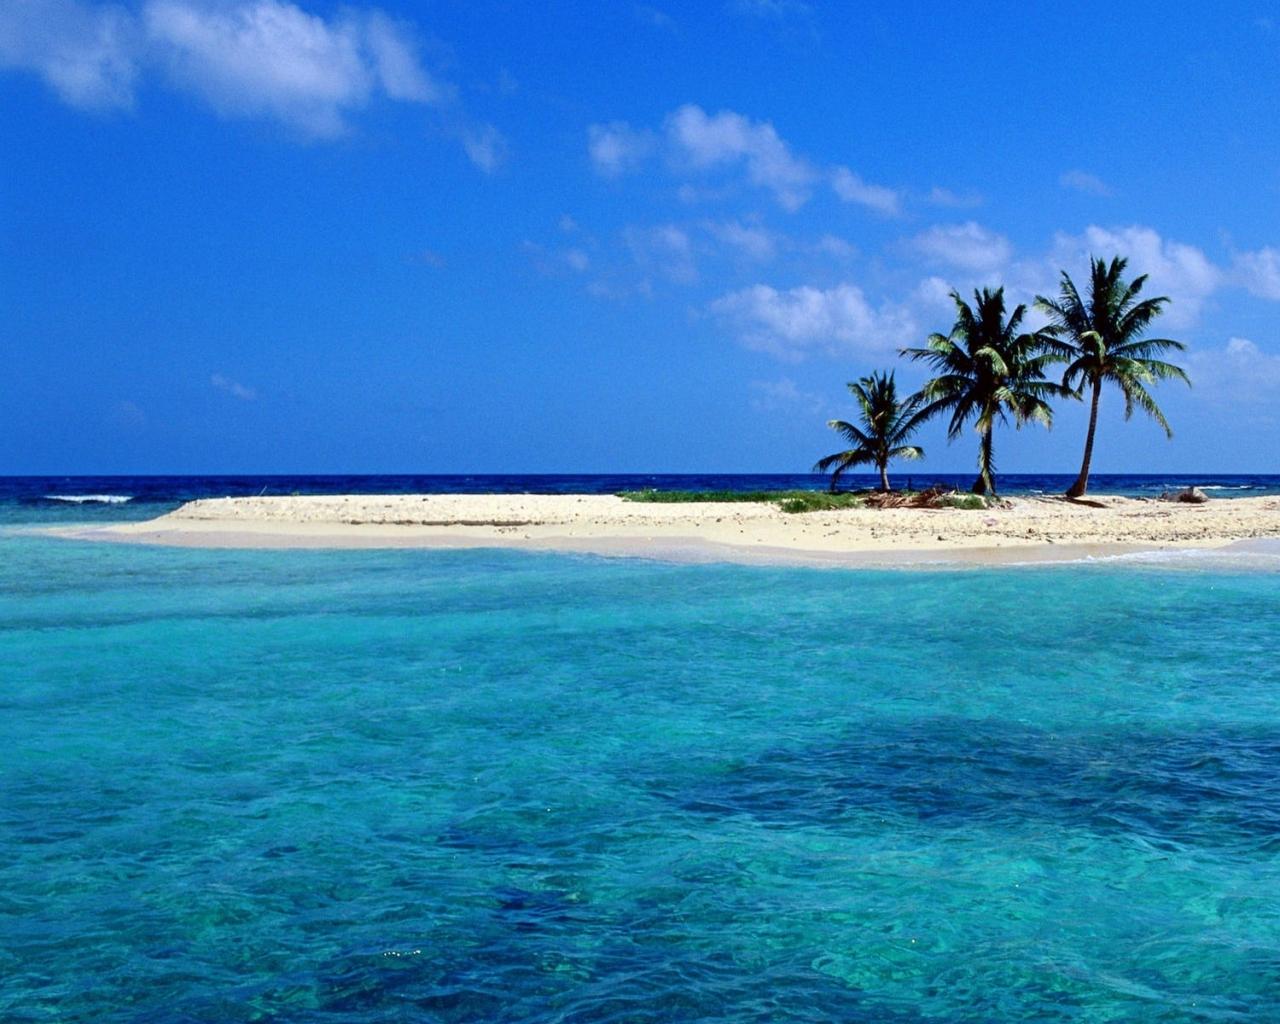 Download Wallpapers Download 1280x1024 blue ocean beach trees sea 1280x1024